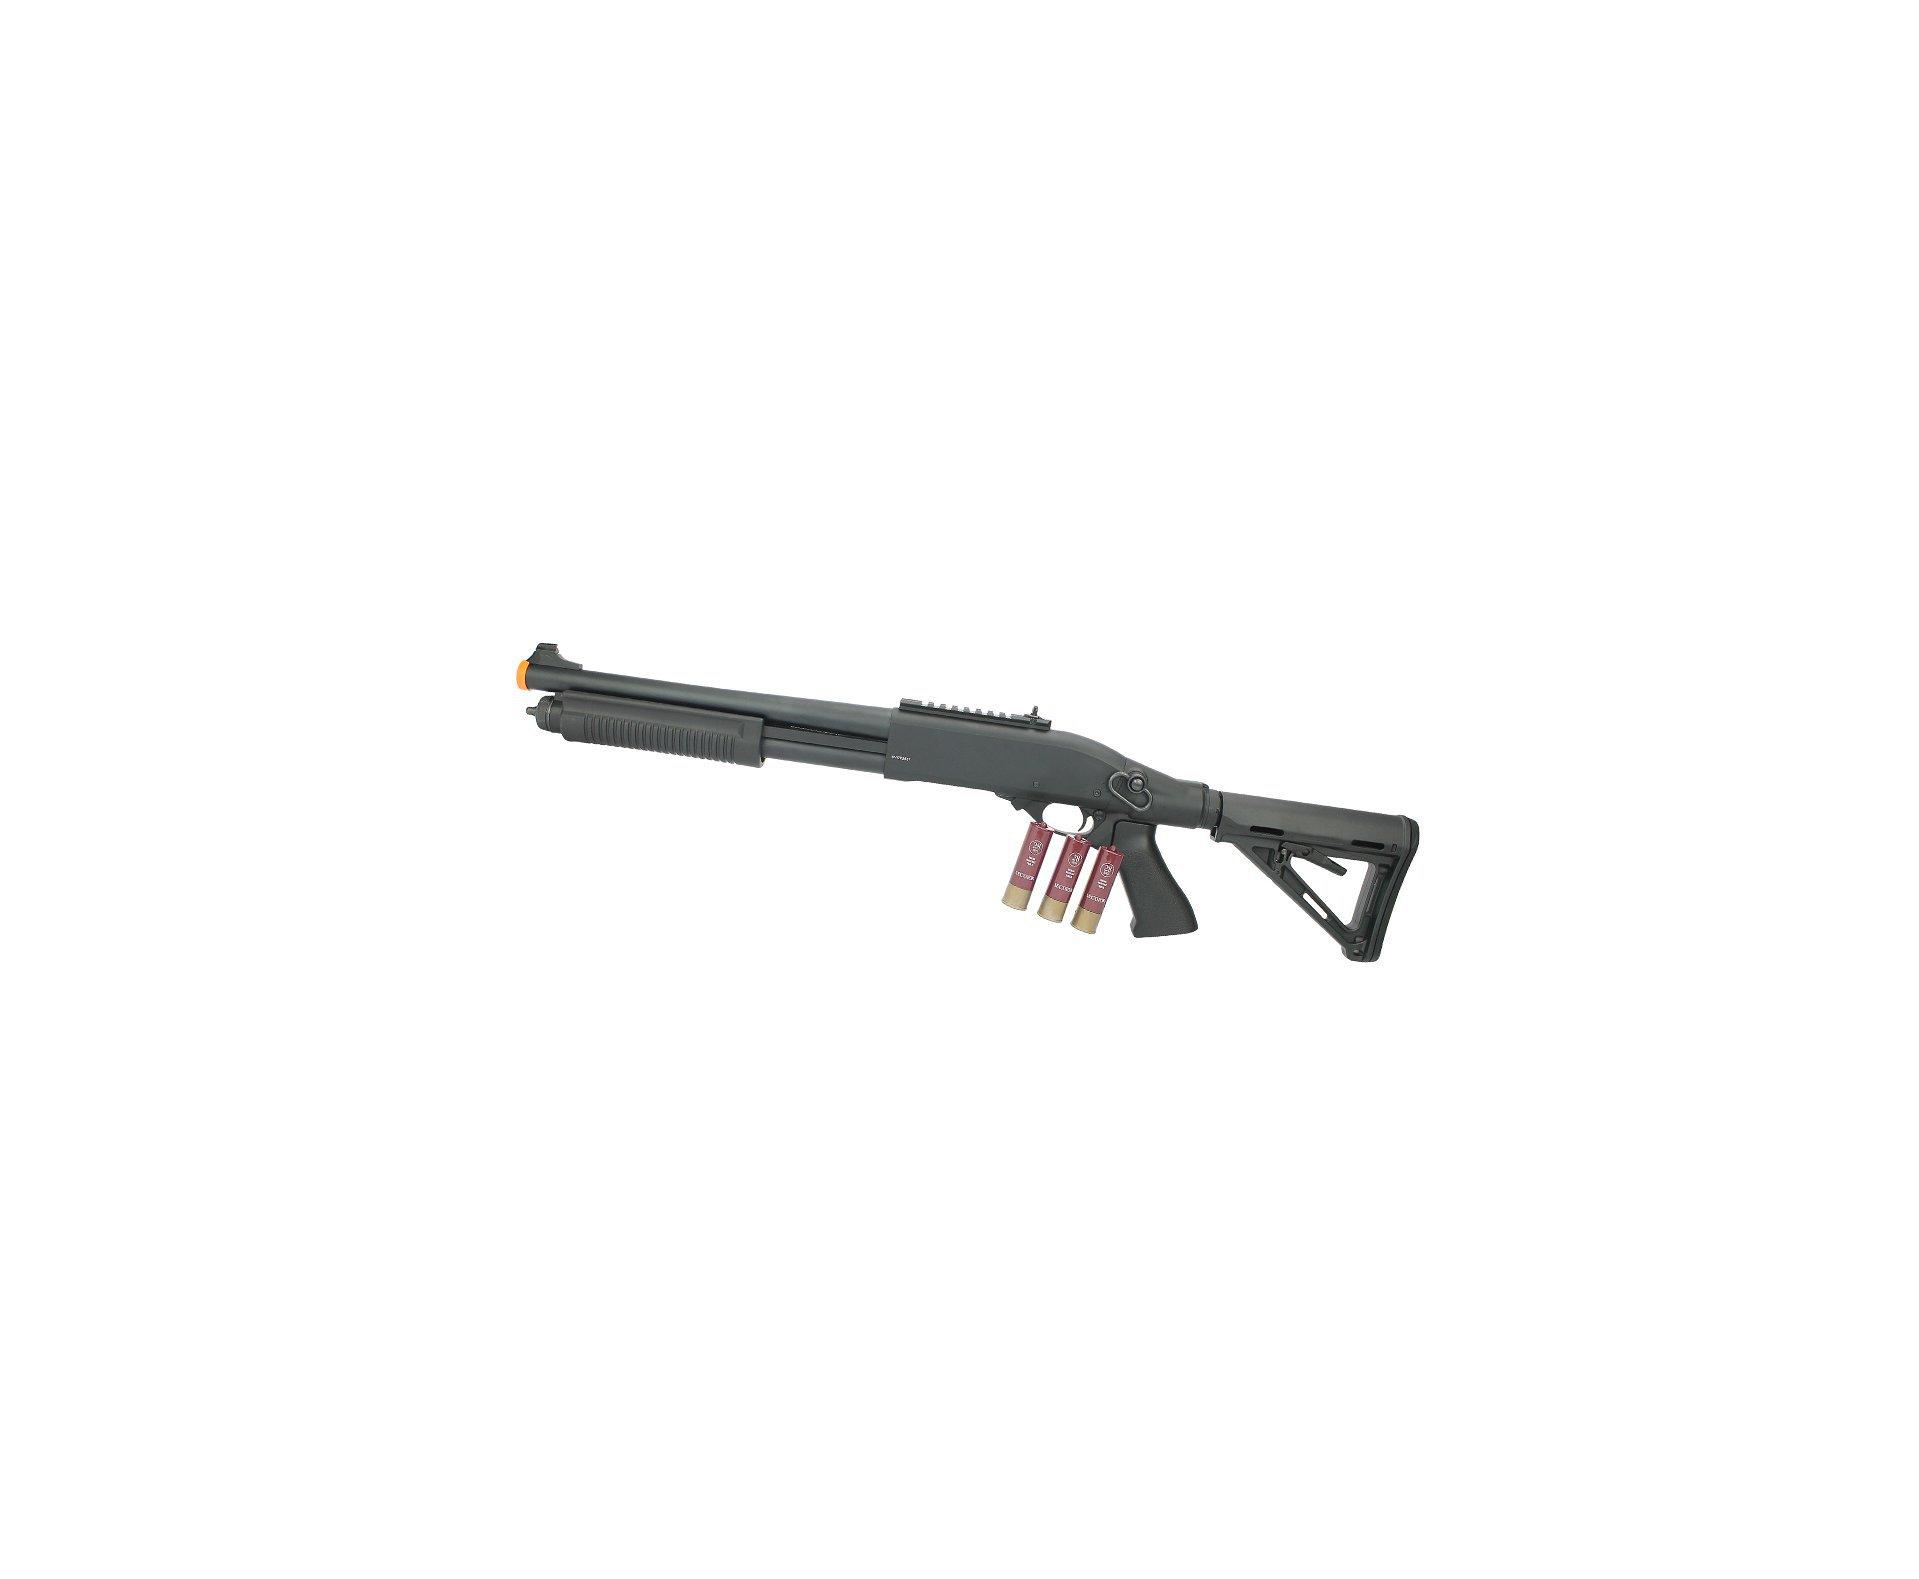 Escopeta Shotgun De Airsoft Full Metal Gbb Epg Velites G-iii Preta Cal 6mm V0006